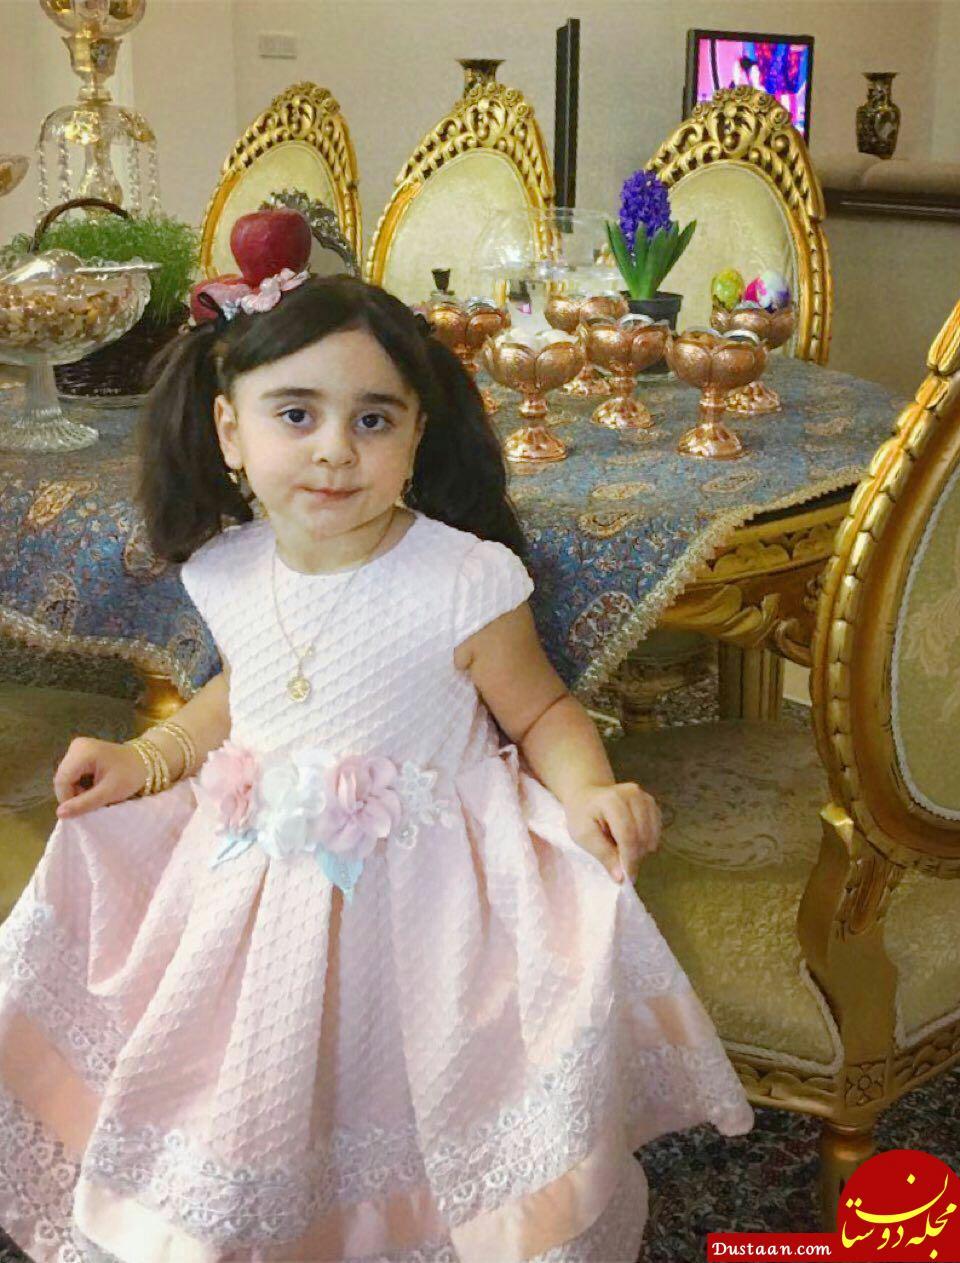 www.dustaan.com فیلم دوربین مدار بسته که به داد دختر ۴ ساله رسید! +فیلم